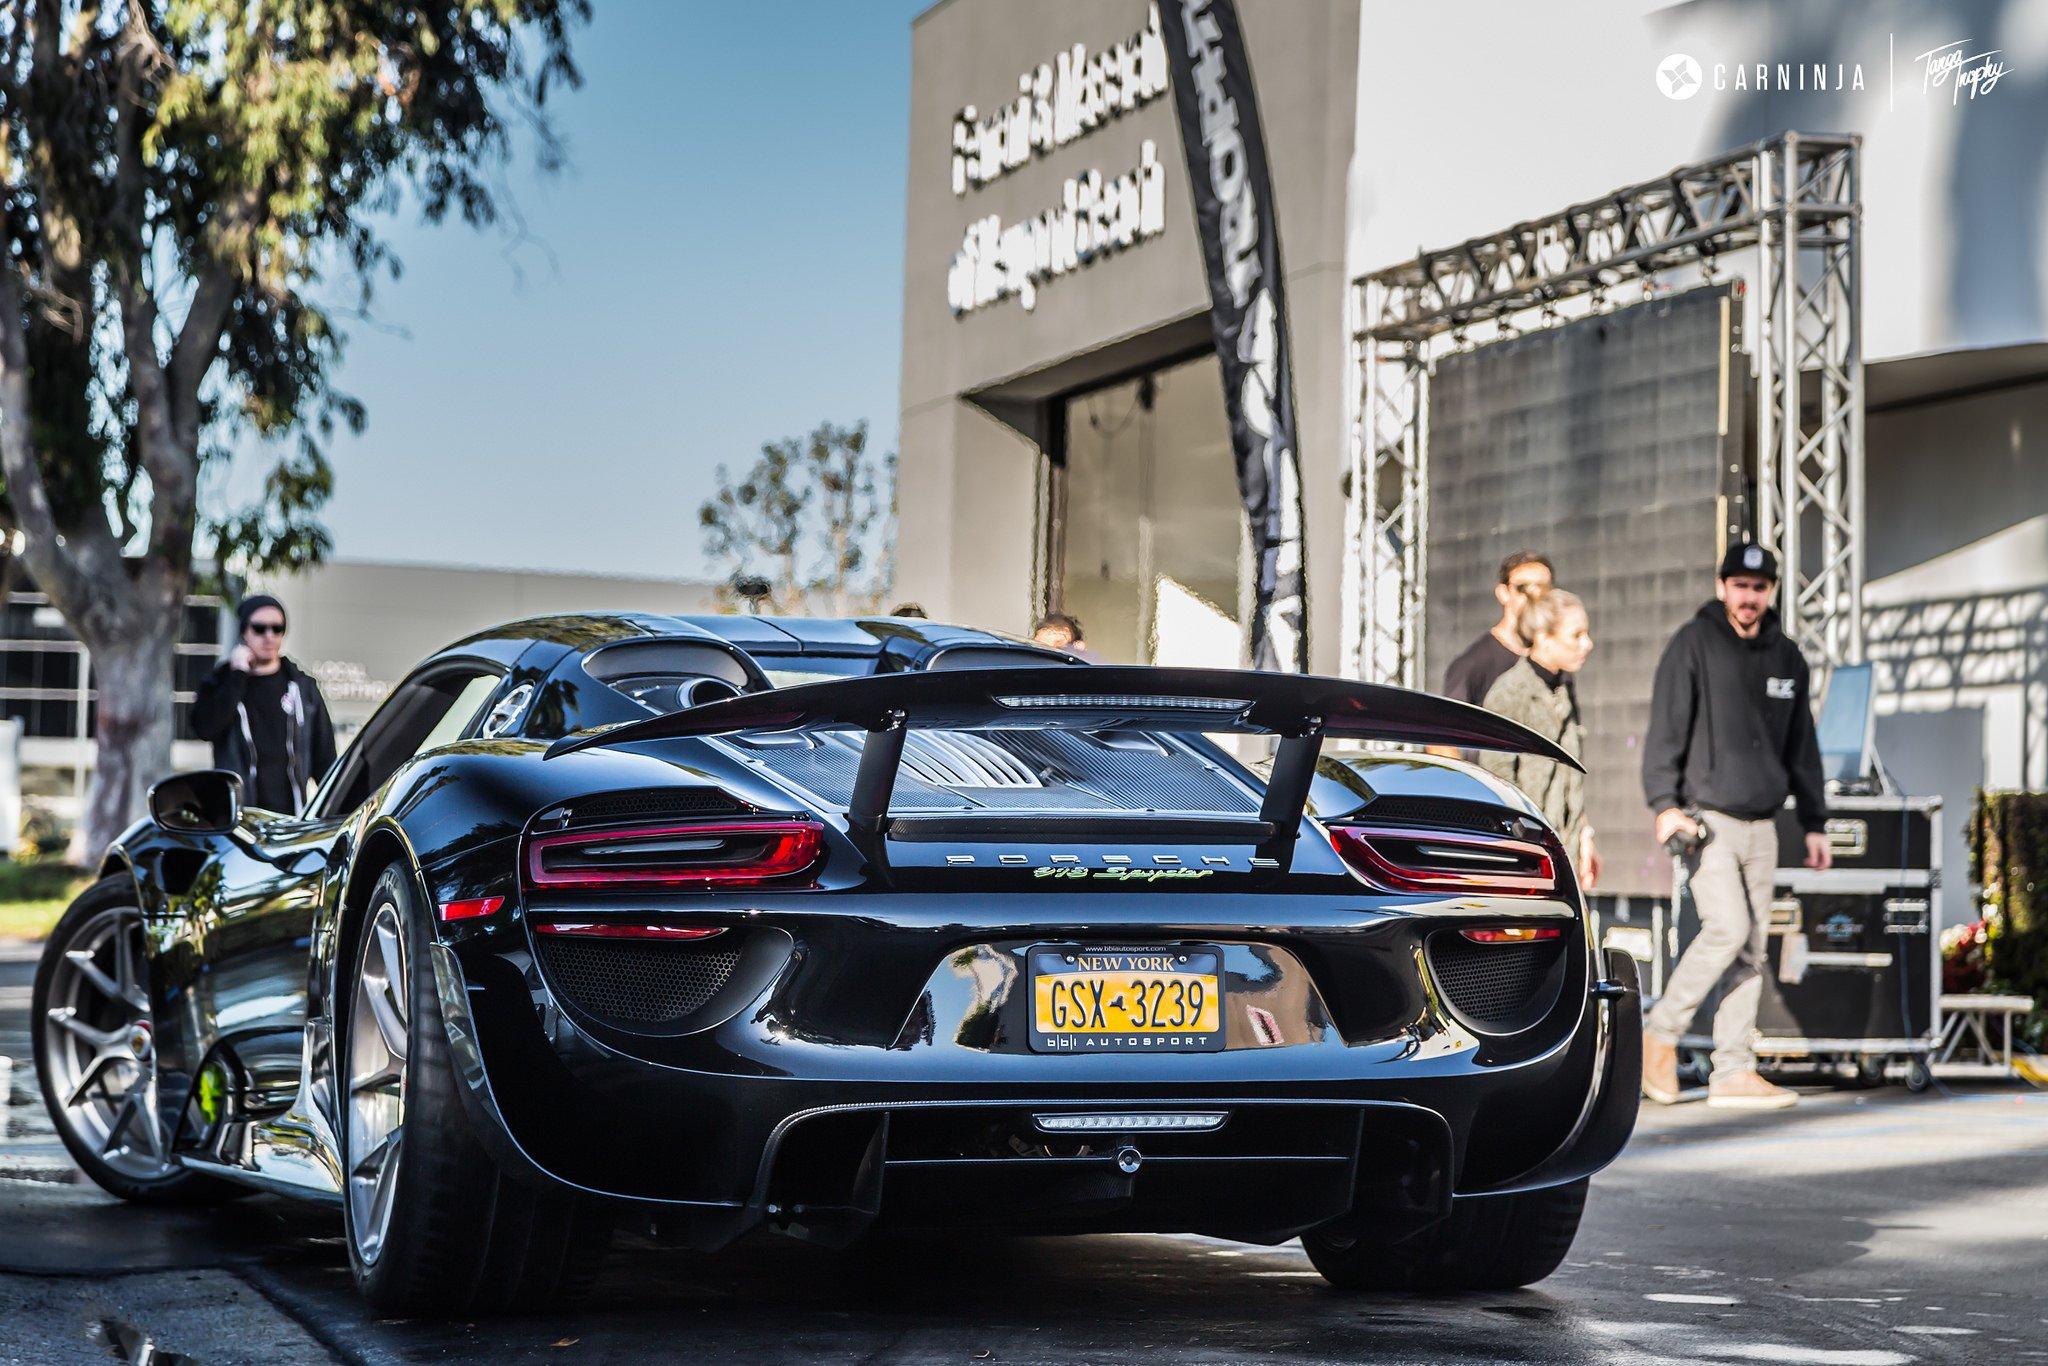 porsche 918 spyder hre wheels tuning cars supercars. Black Bedroom Furniture Sets. Home Design Ideas